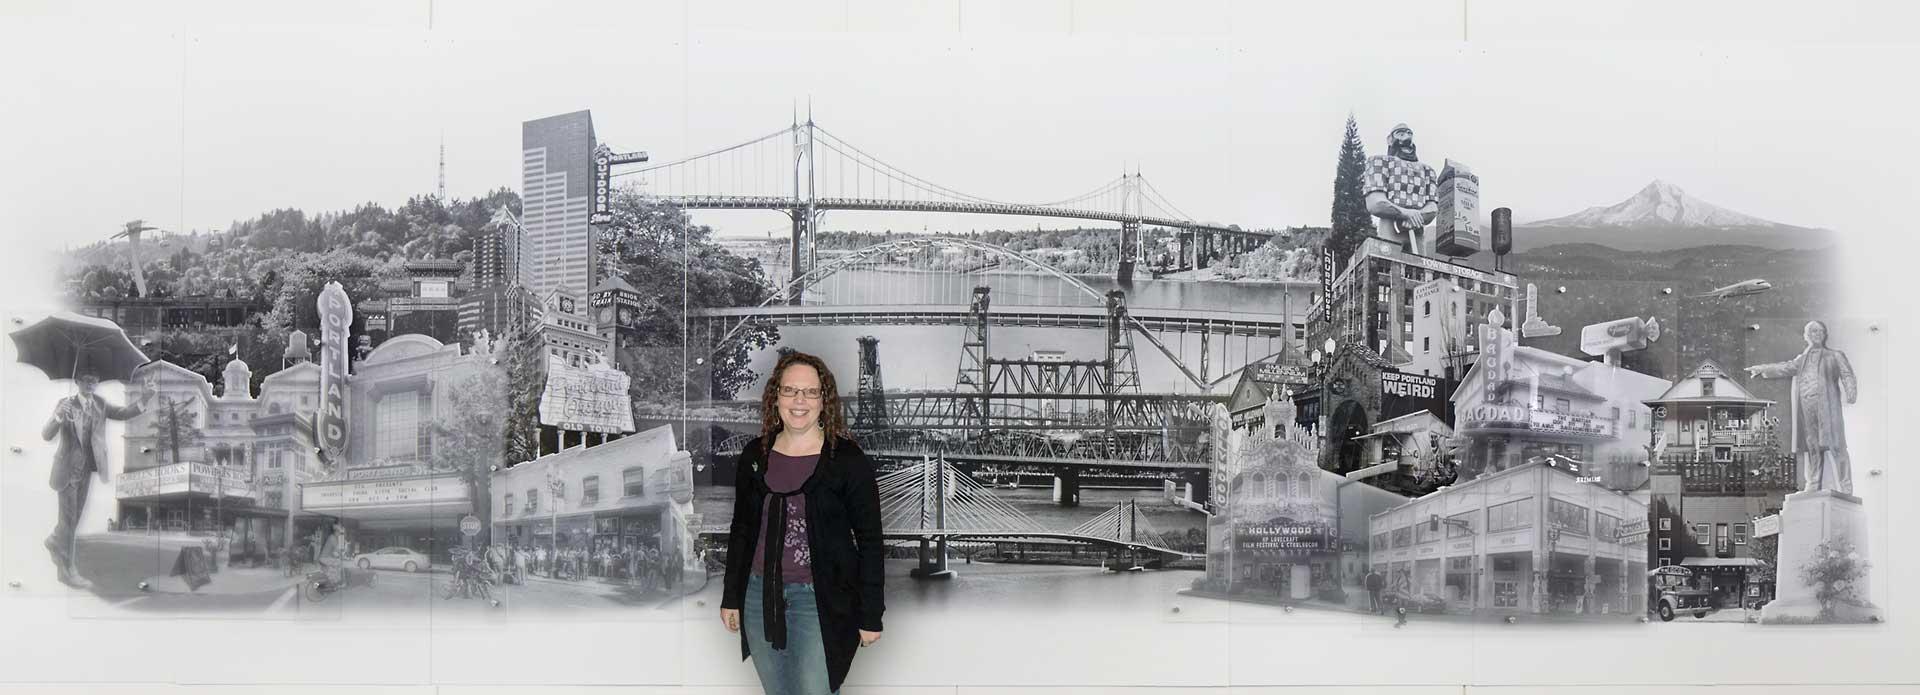 About Beth Kerschen